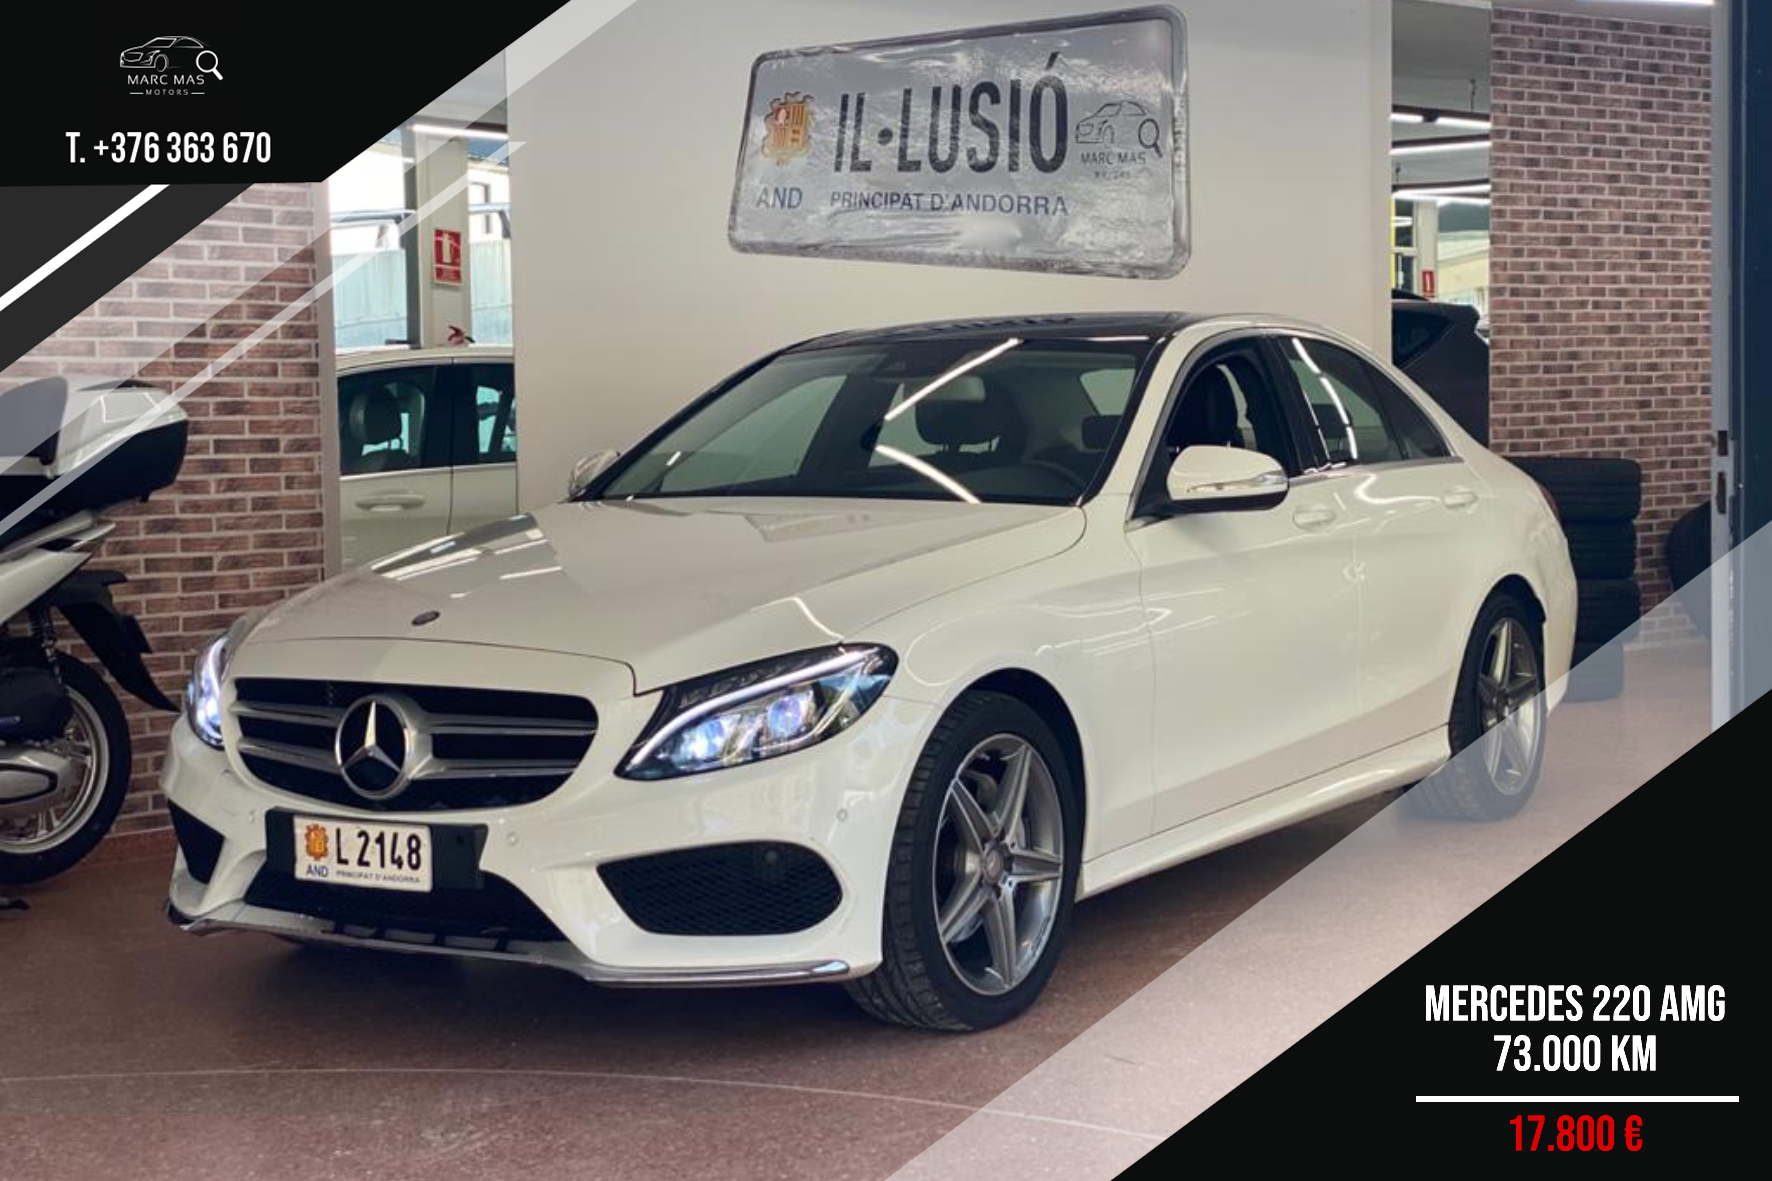 Mercedes-Benz - C 220 - PACK AMG   17.800 €